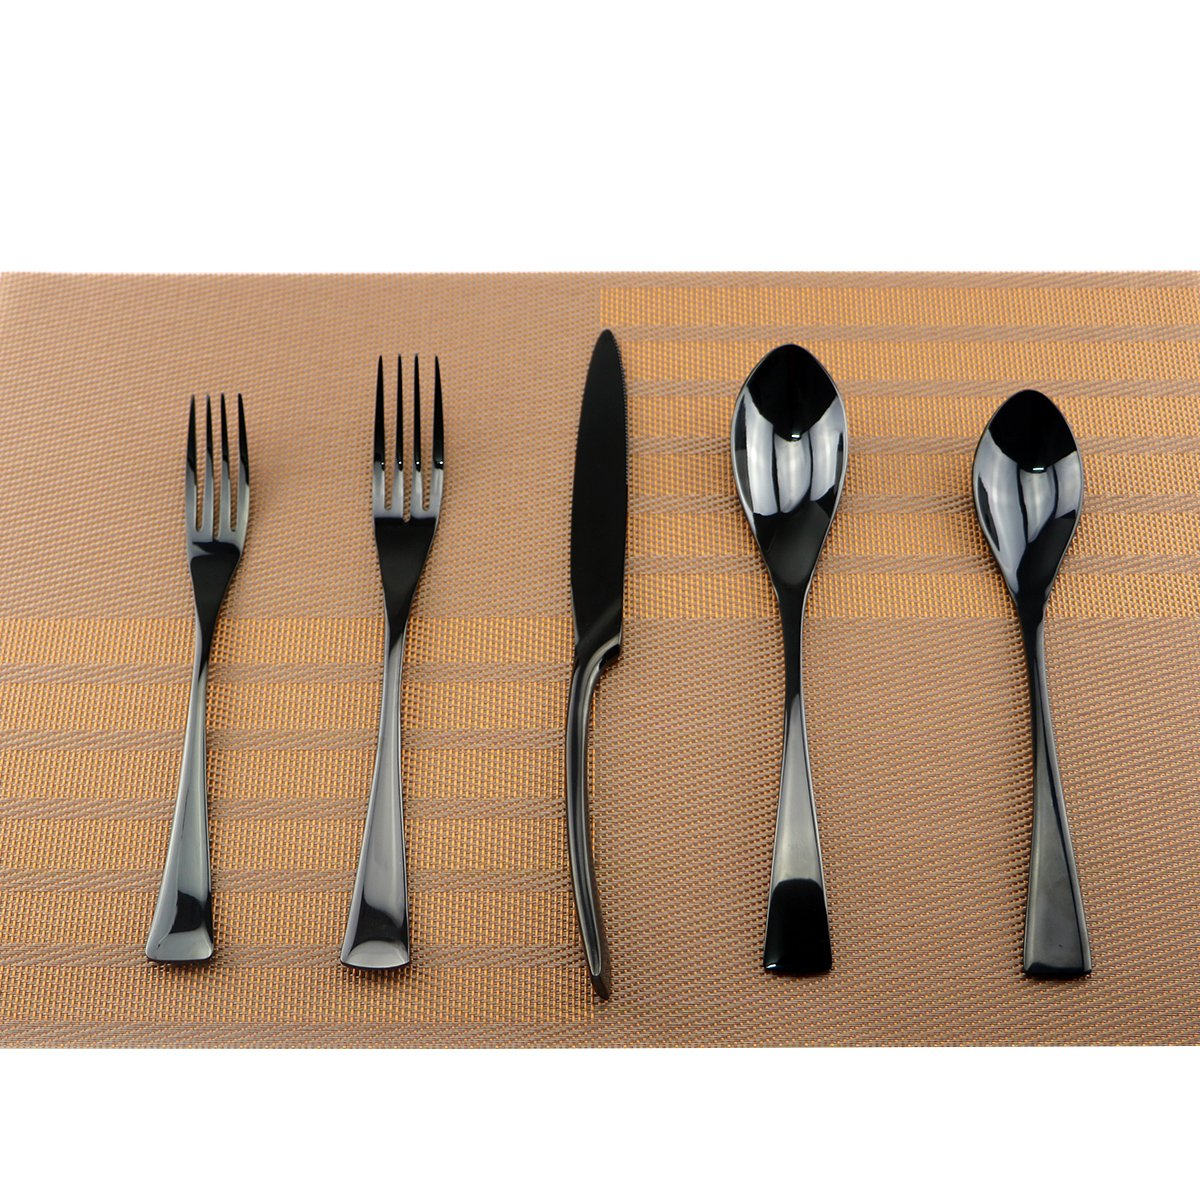 Uniturcky Mirror Polishing Black 18/10 Stainless Steel, 20-Piece Flatware Silverware Set Service for 4 Stainless Steel Cutlery Include Knife Fork Spoon Dishwasher Safe